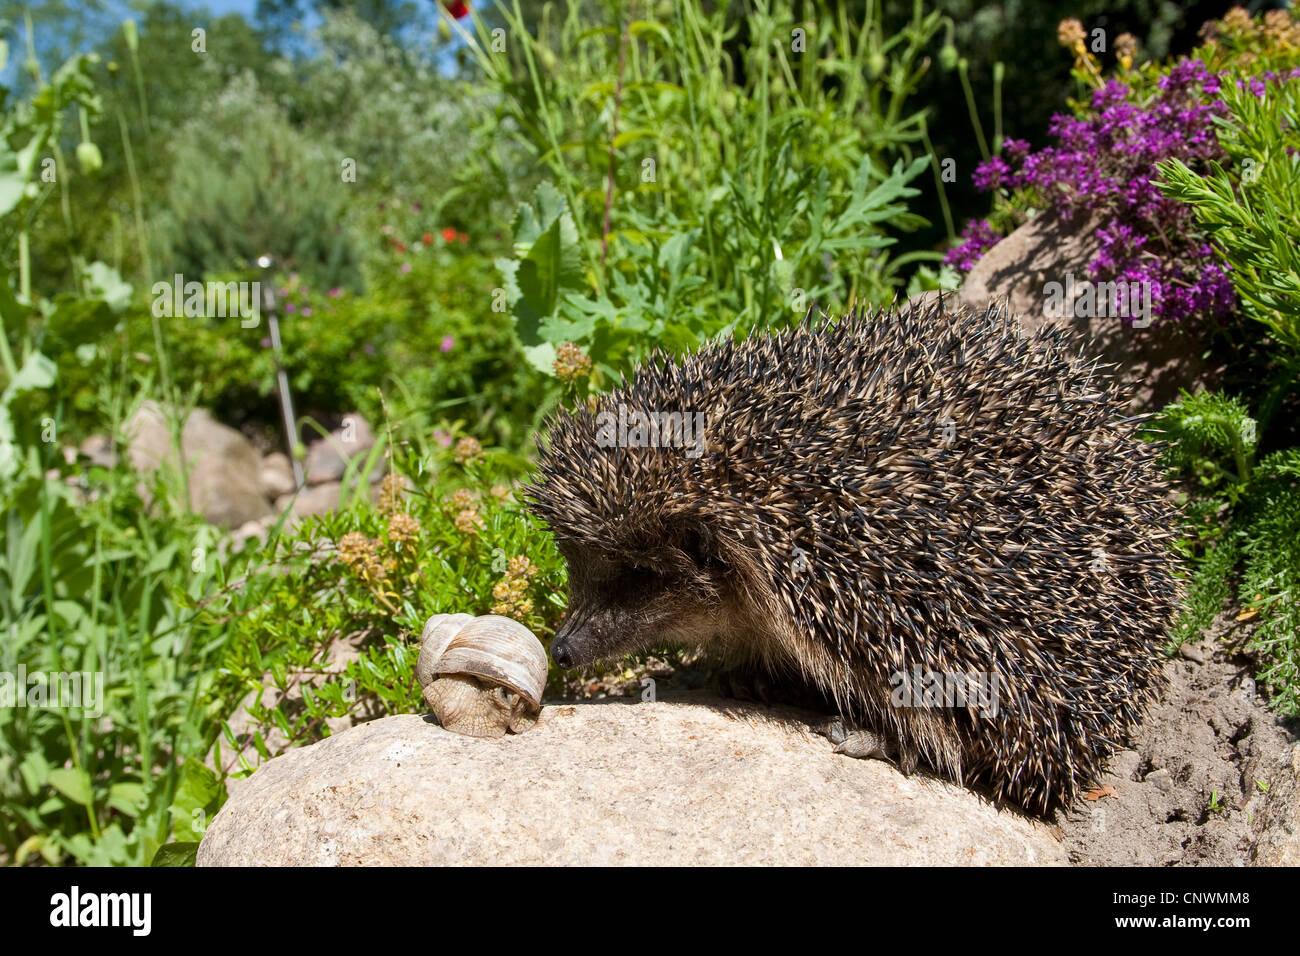 western hedgehog, European hedgehog (Erinaceus europaeus), with banded snail, Germany - Stock Image